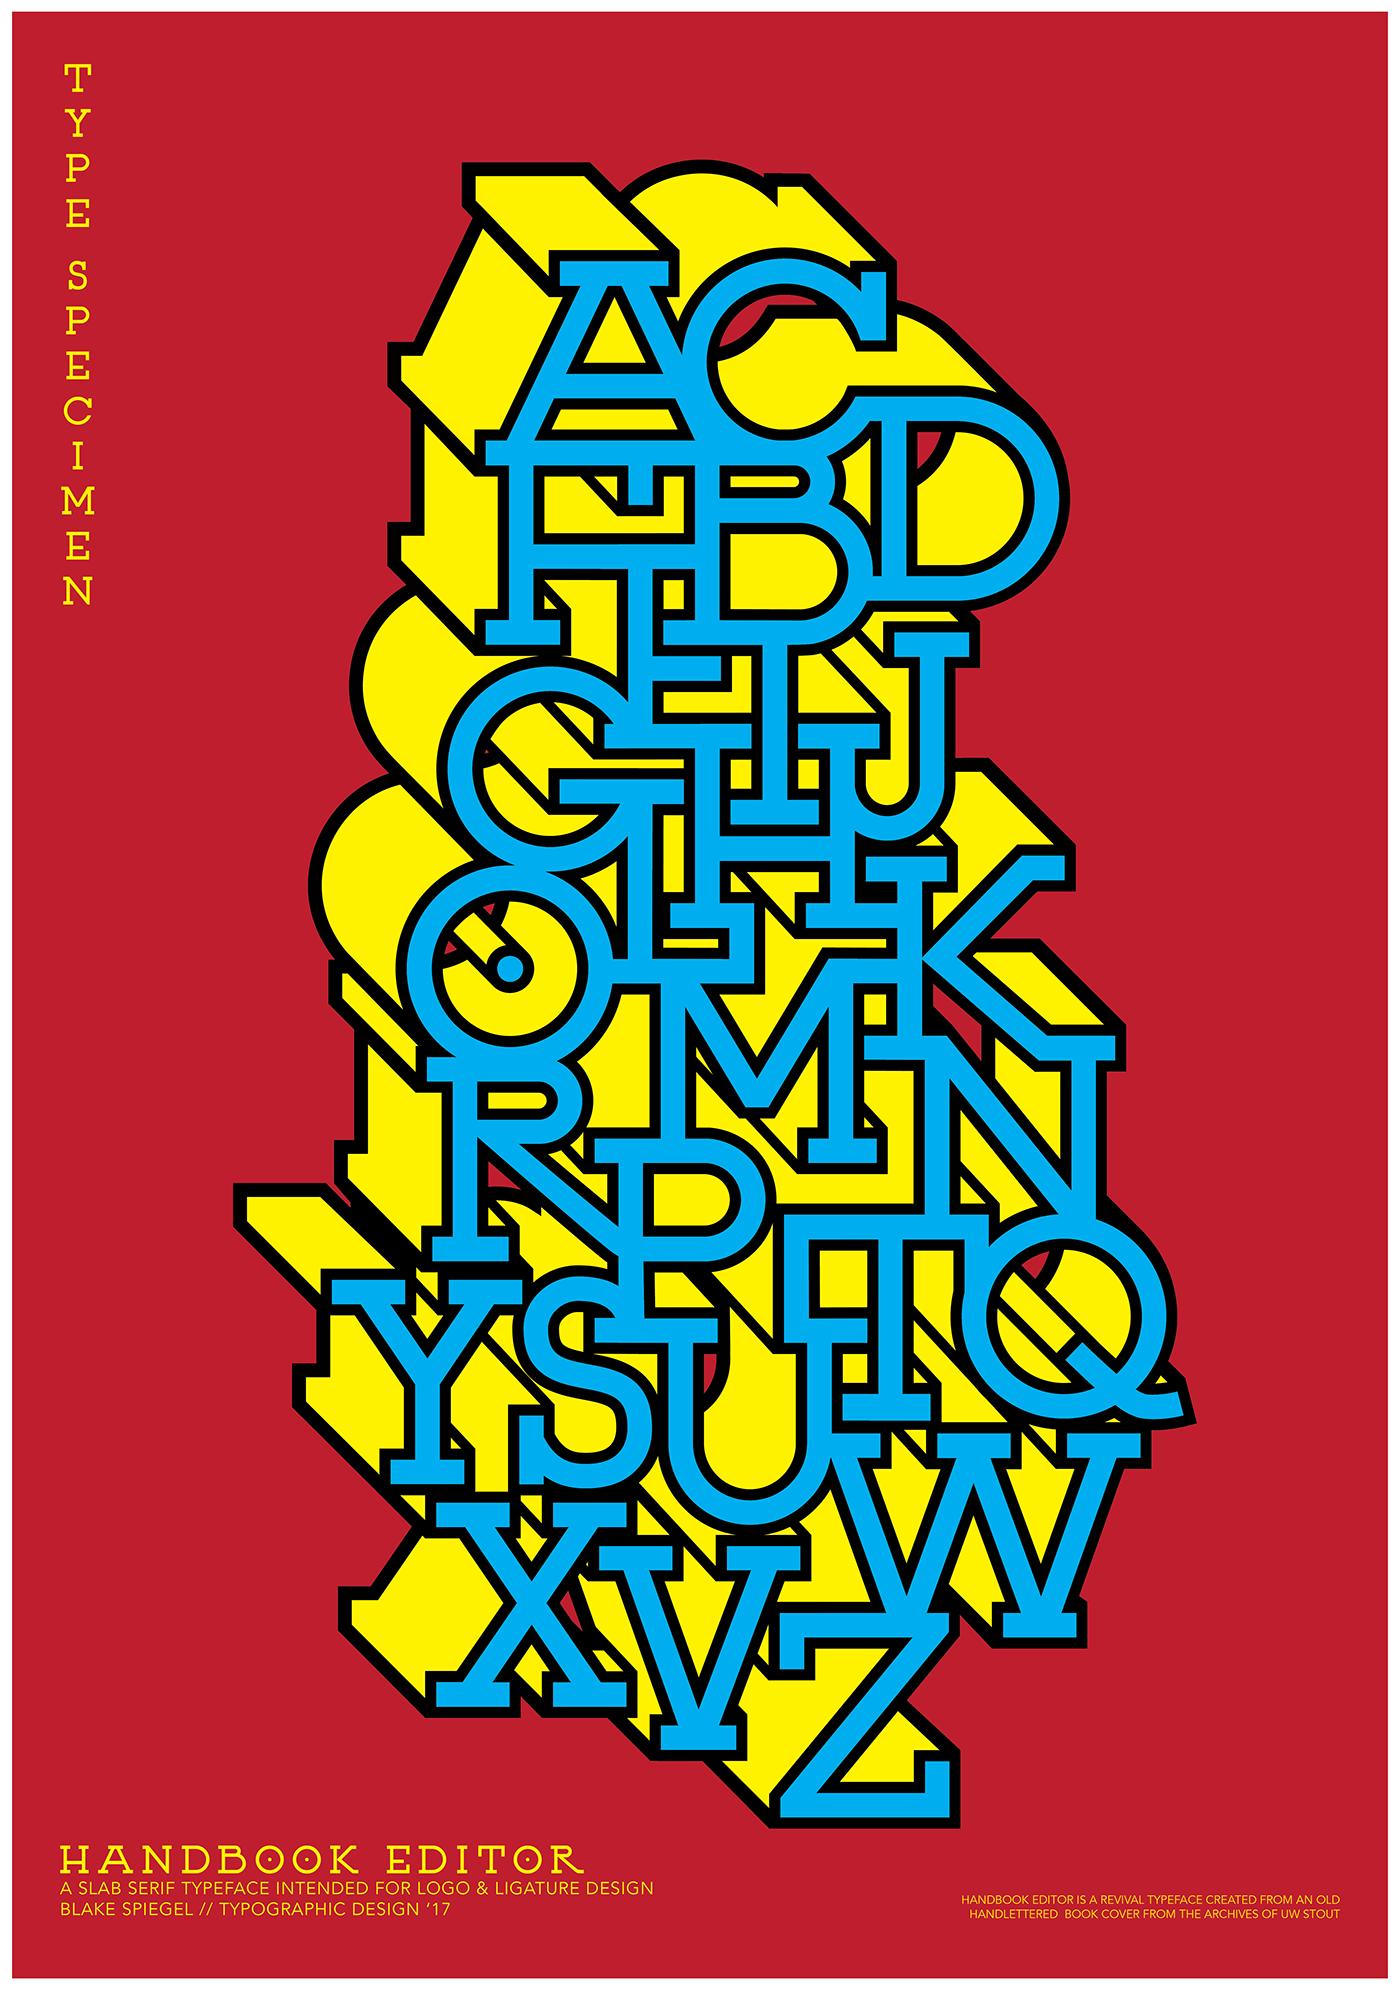 Handbook Editor Slab Serif Typeface